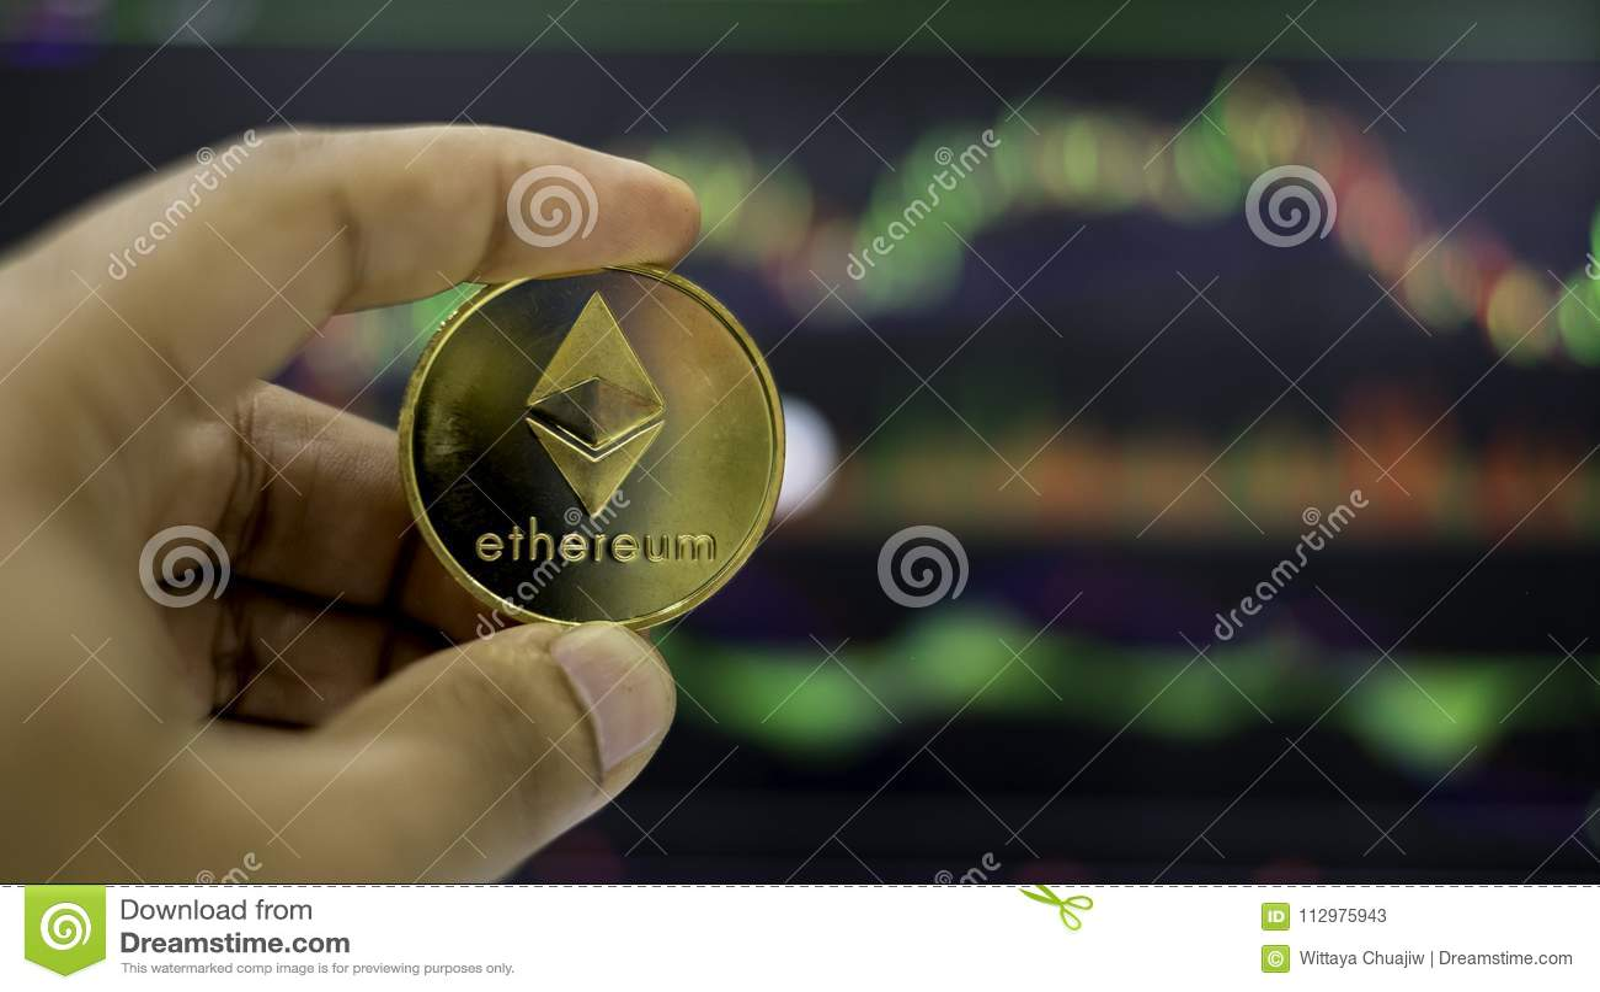 Cyptocurrency; digital money for new financial platform